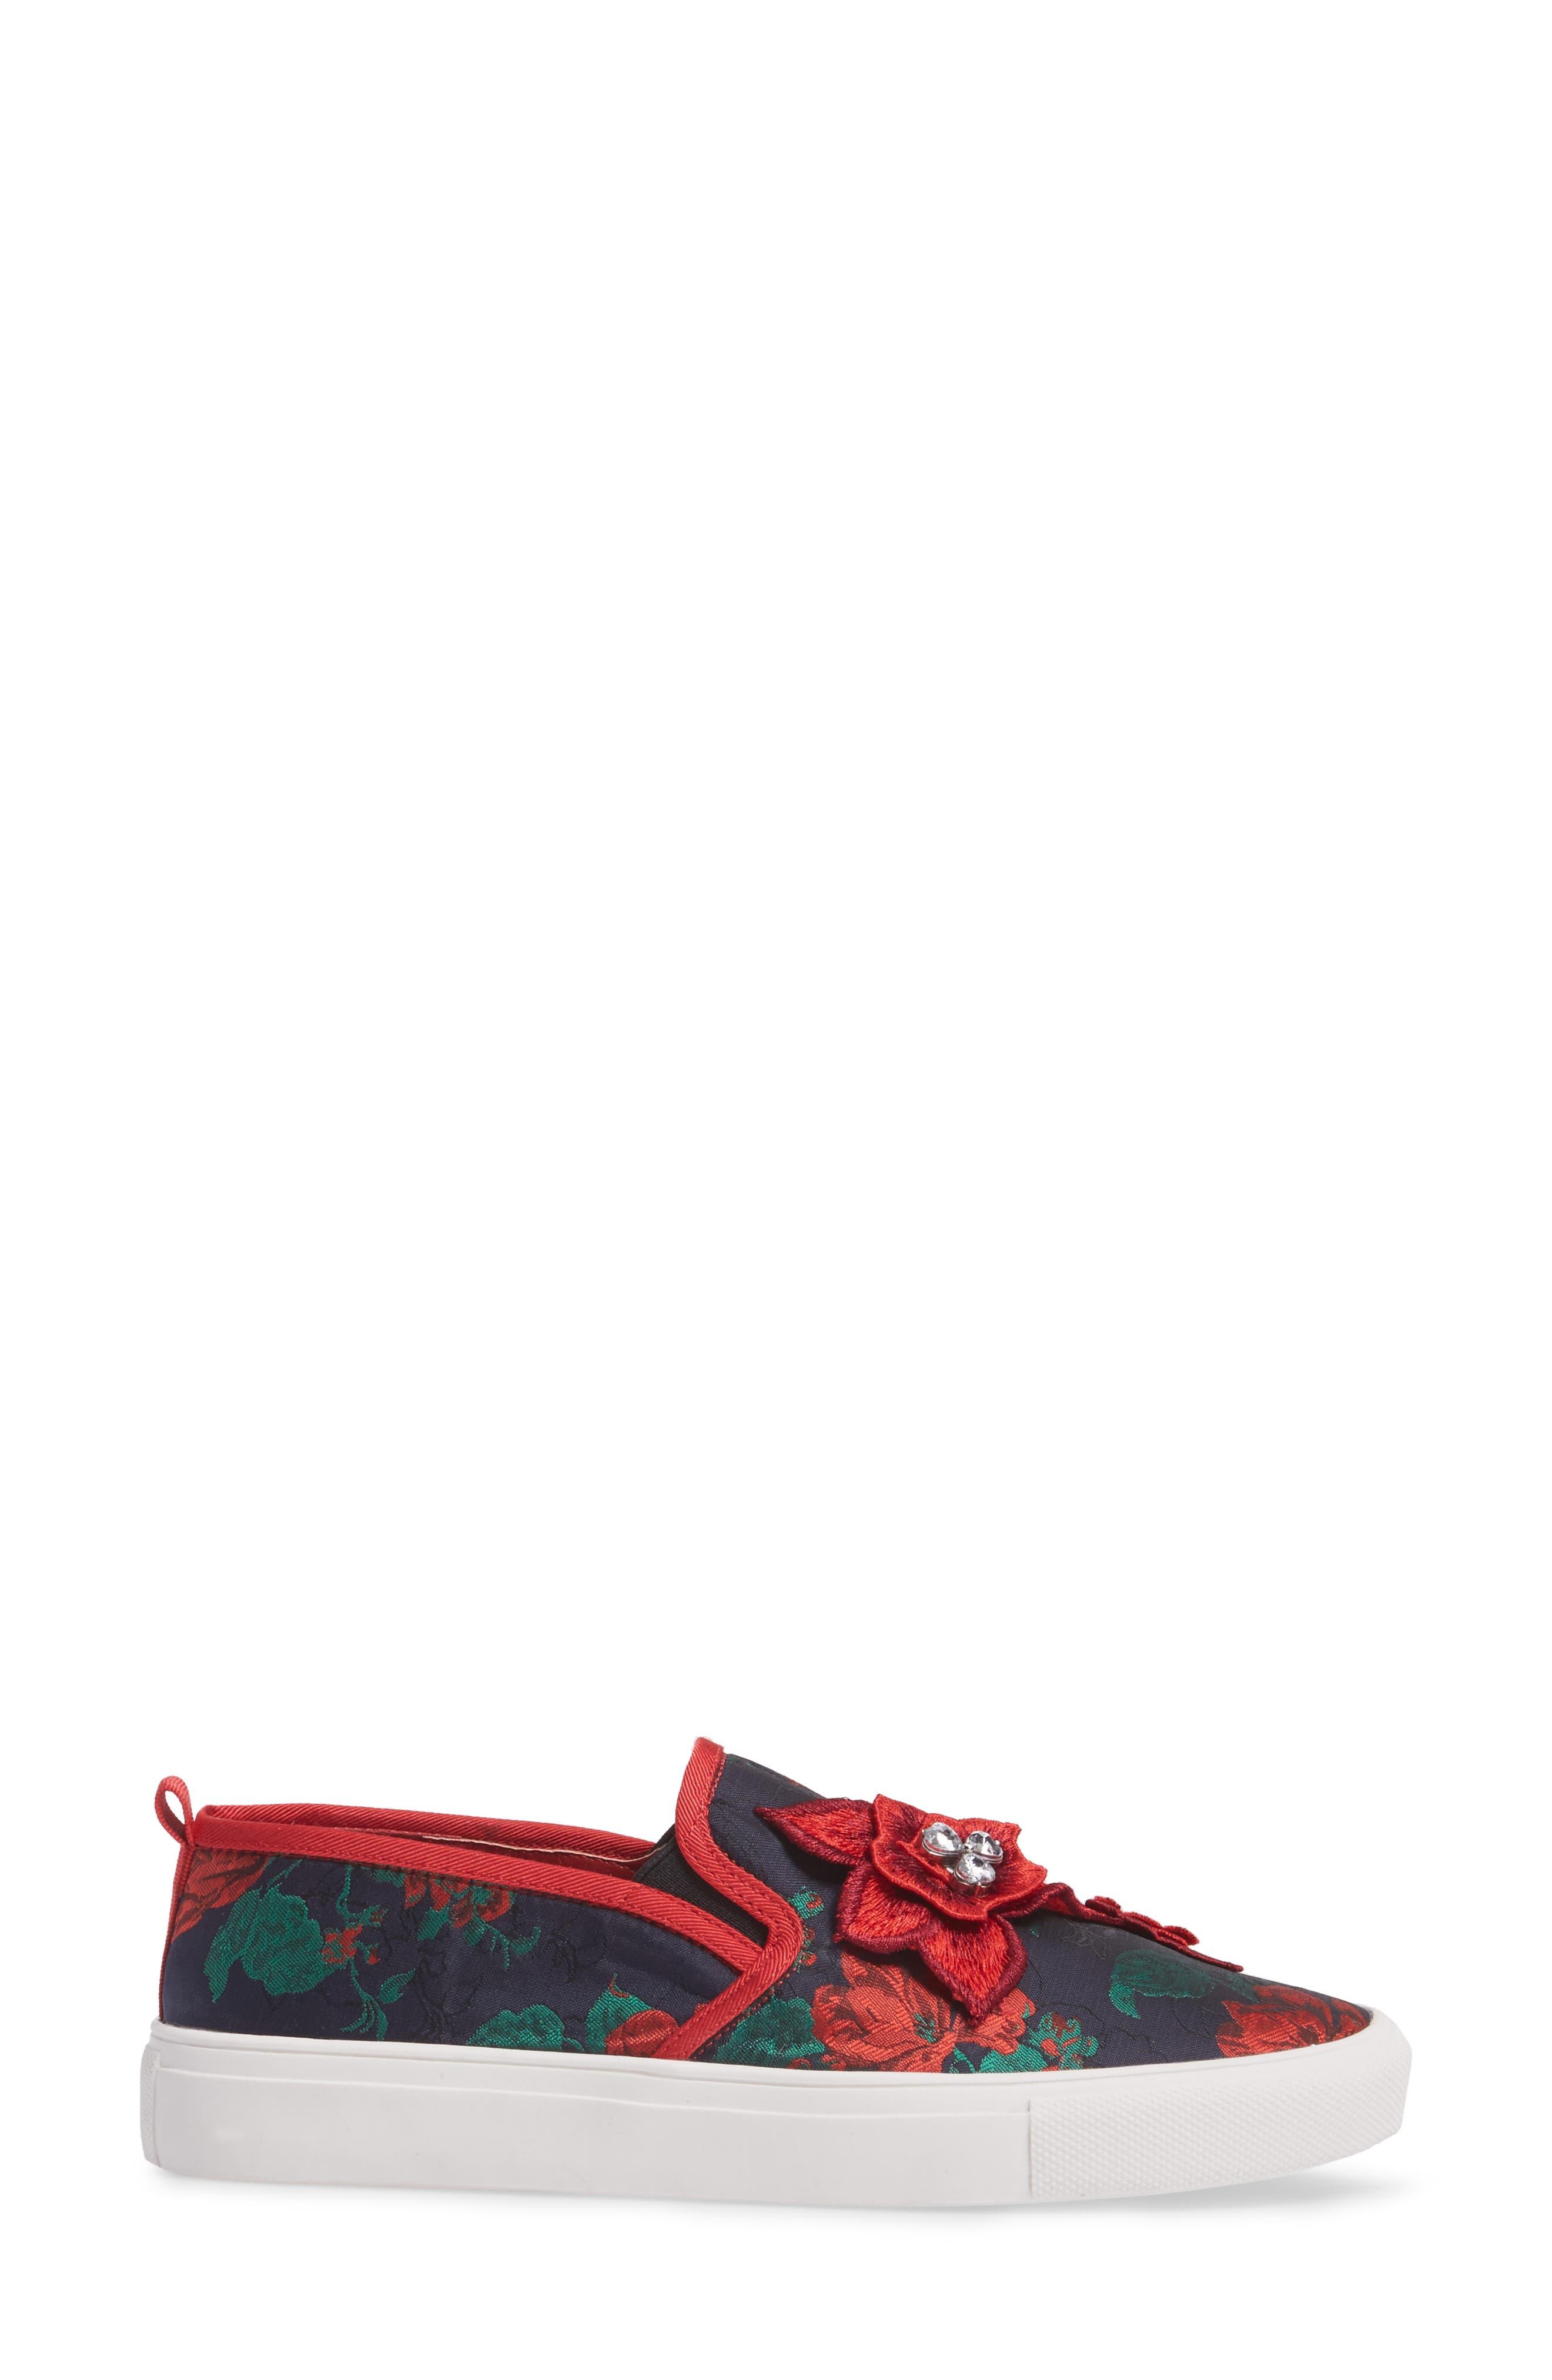 Alternate Image 3  - Topshop Tessa Embroidered Slip-On Sneaker (Women)